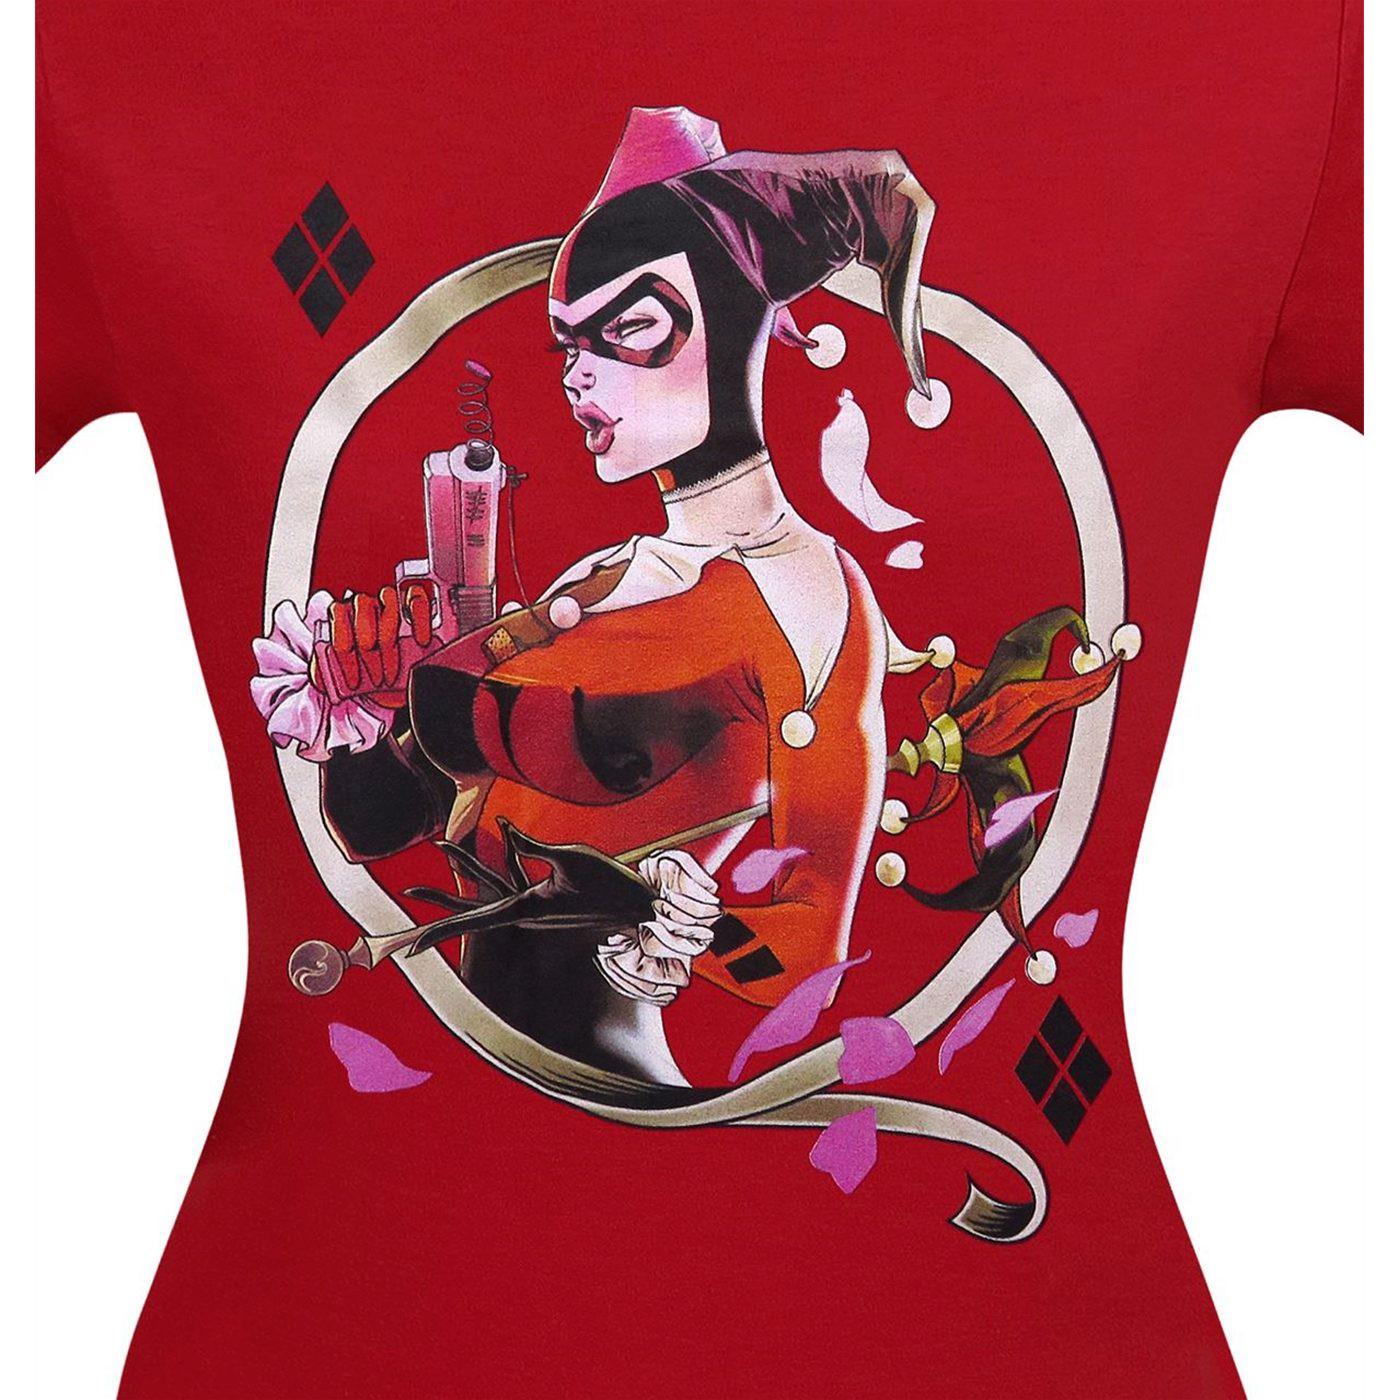 Harley Quinn Image on Red Women's T-Shirt